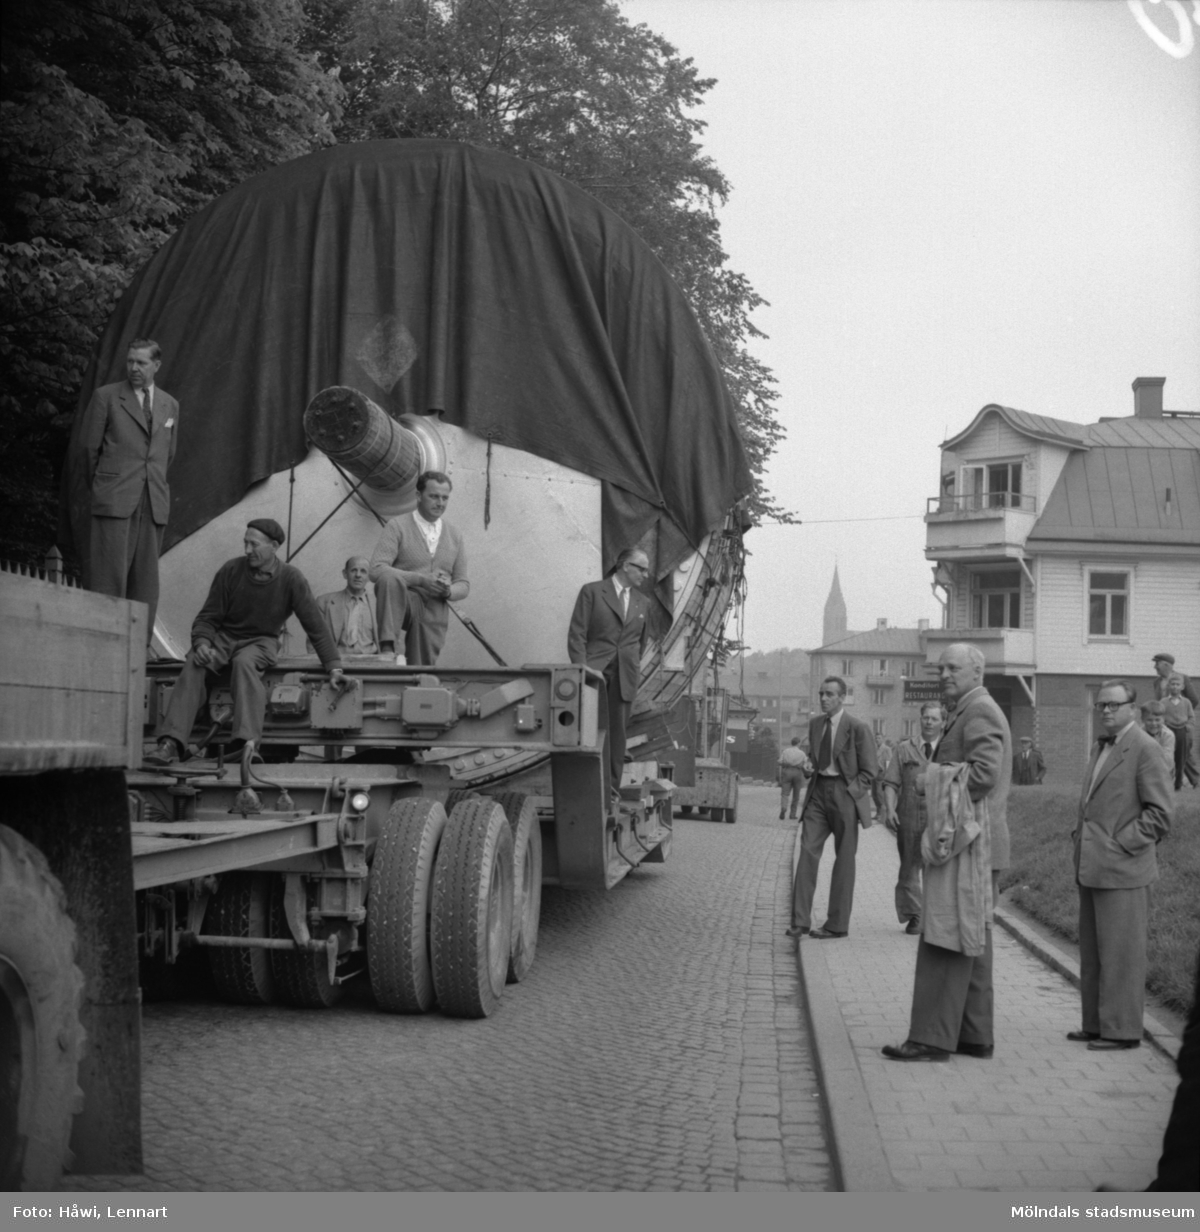 Transport av Papyrus PM2 yankeecylinder. Cylindern fraktas med lastfordon mot Papyrus i Mölndal, 2/6 1956.